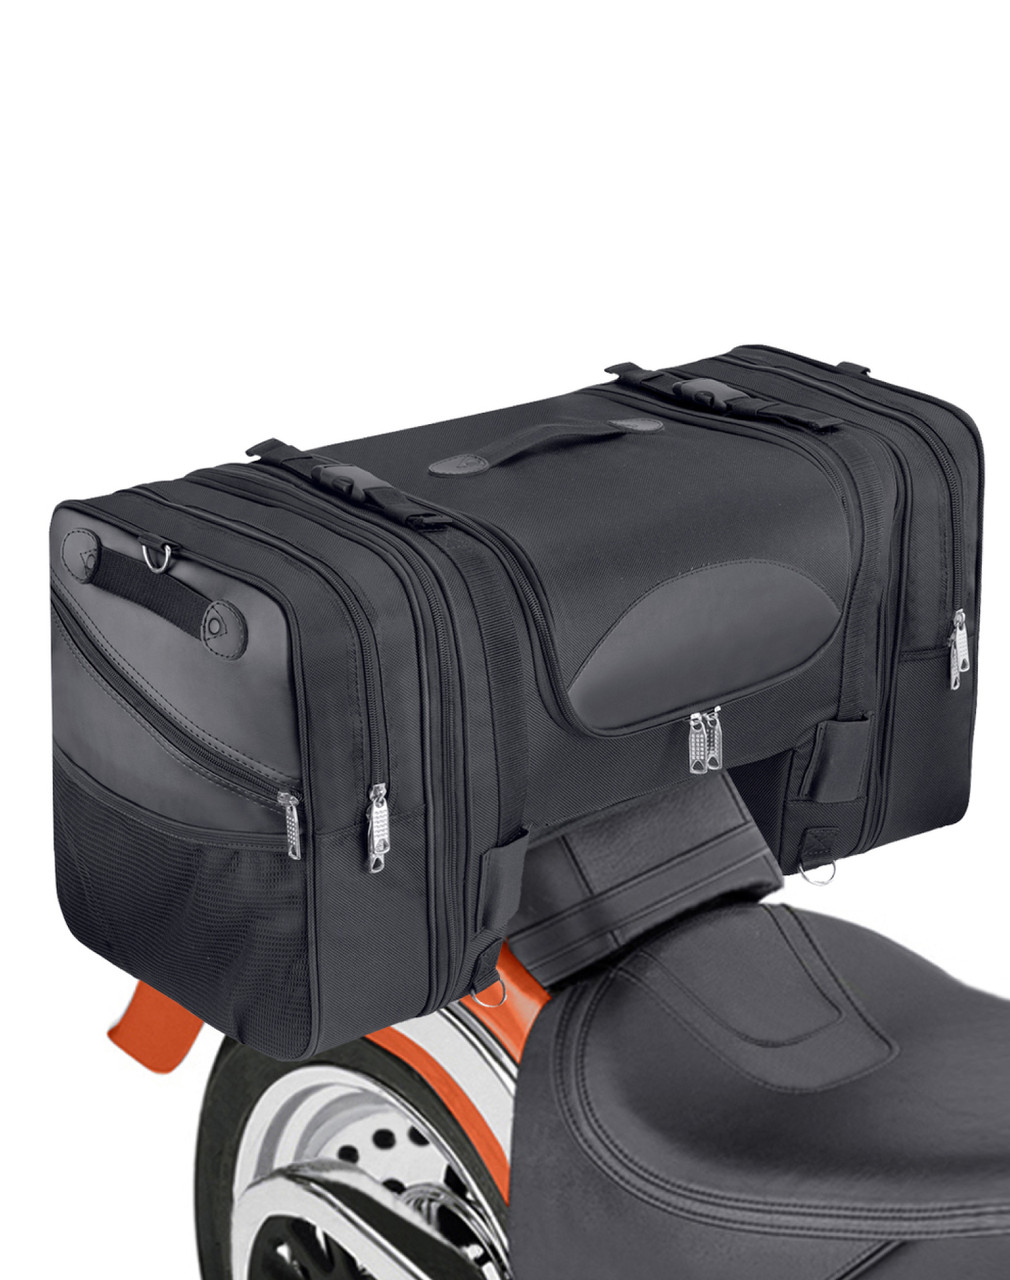 Honda Viking Expandable Cruiser Large Motorcycle Sissy Bar Bag